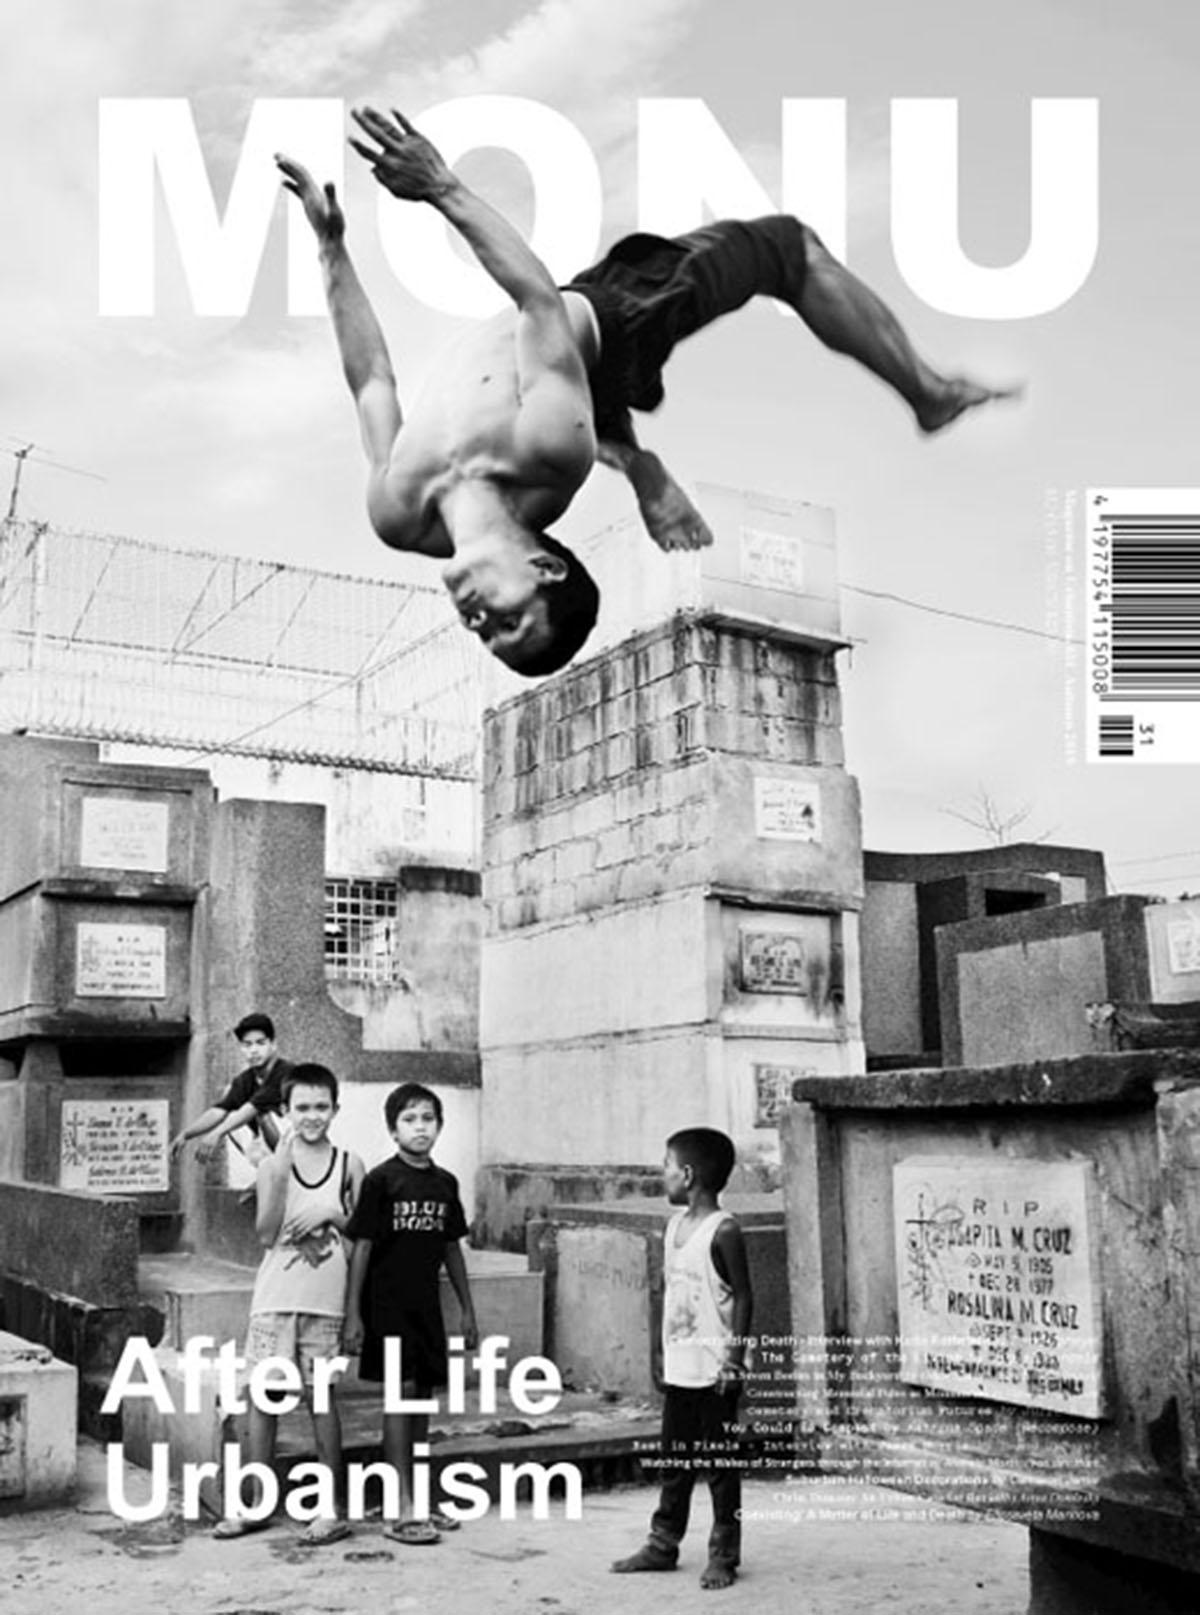 monu-after-life-urbanism